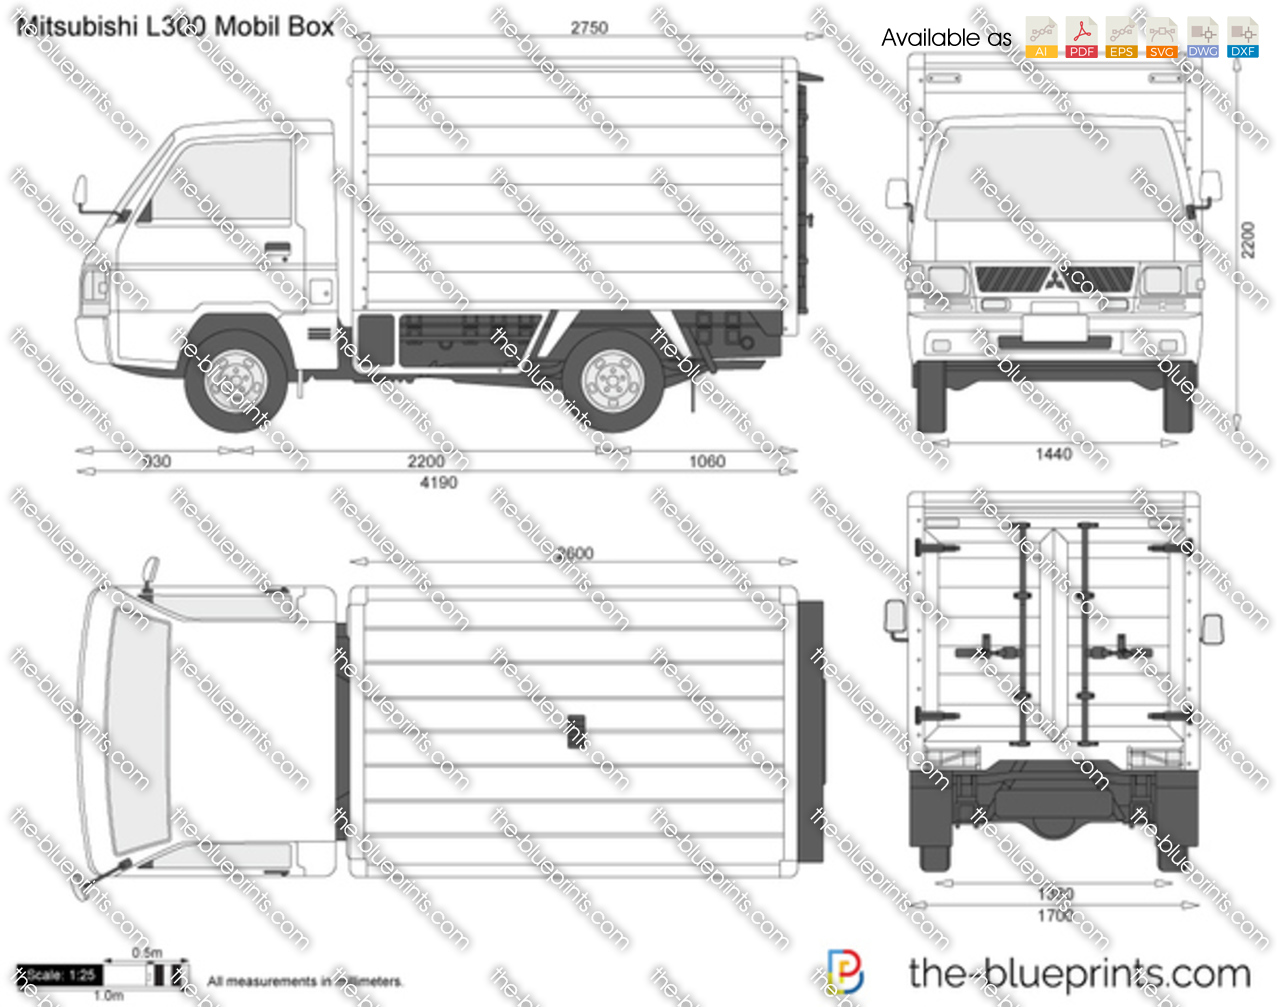 Mitsubishi L300 Mobil Box 1991